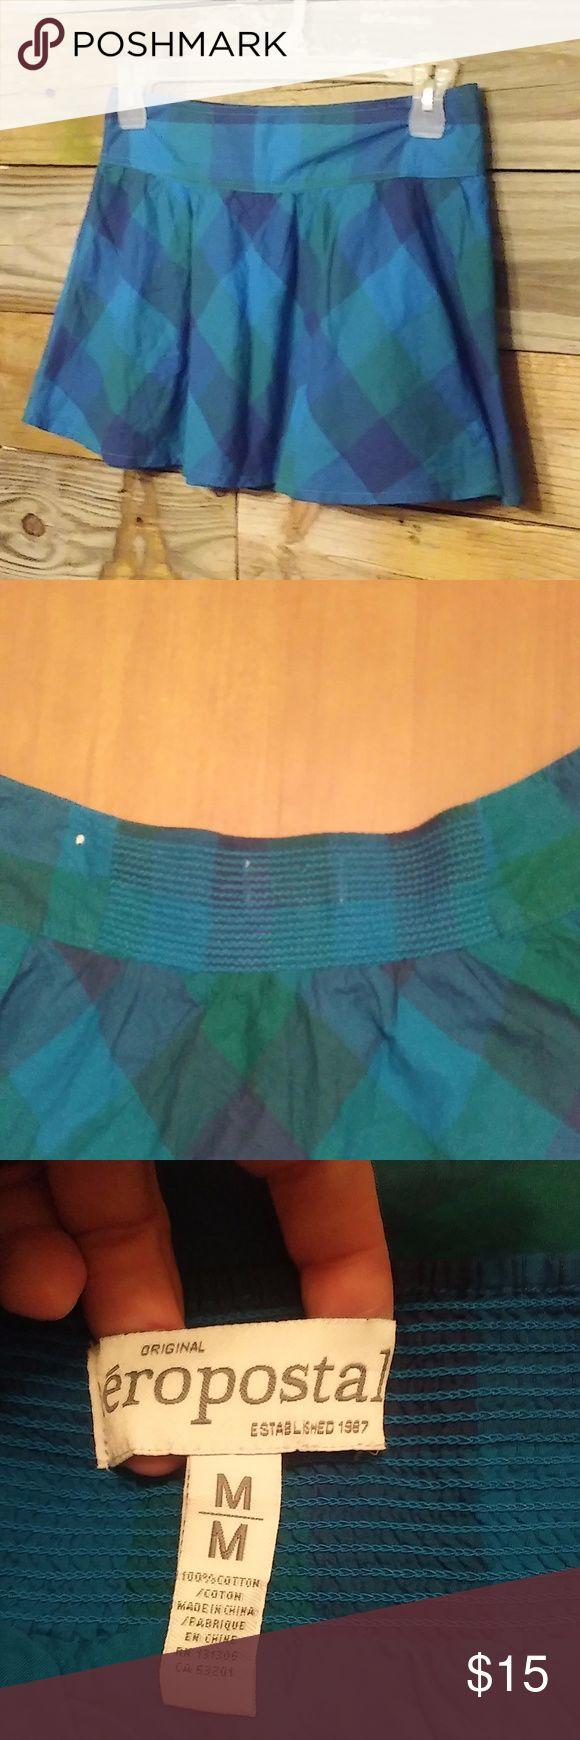 Aeropostale plaid cotton skirt like new 100% cotton Aeropostale plaid skirt features elastic waist in the back.  Slip on style. Aeropostale Skirts Mini